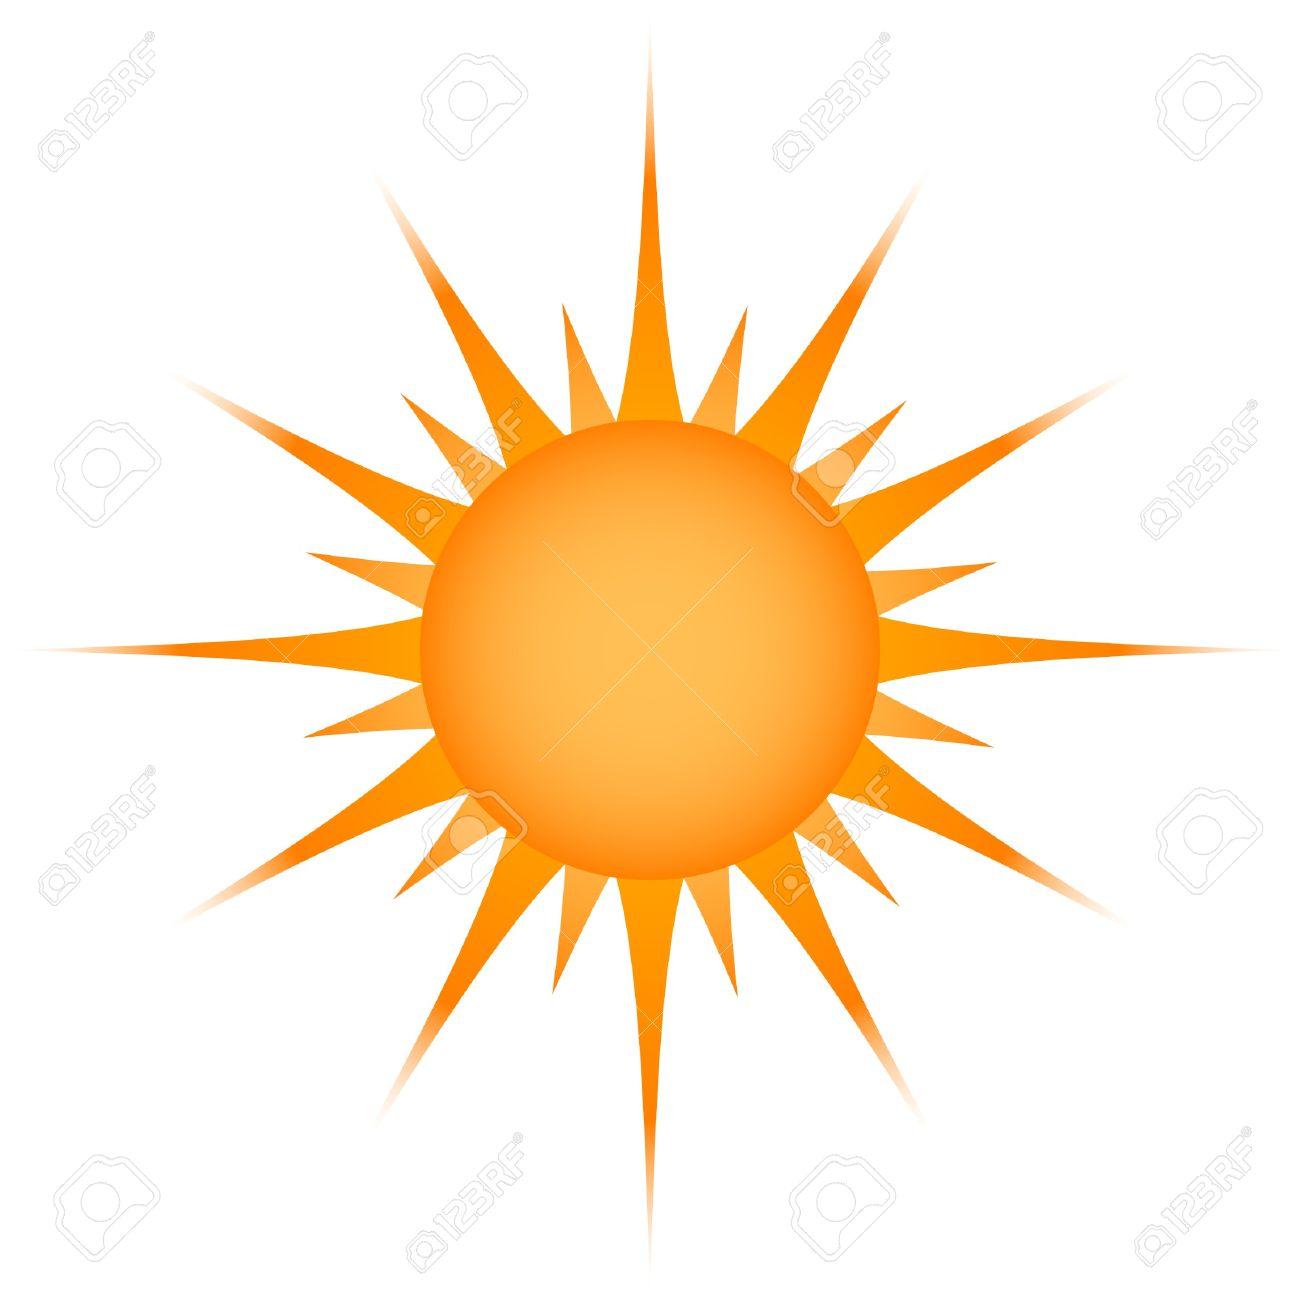 Sun symbol stock photo picture and royalty free image image 7763456 sun symbol buycottarizona Images